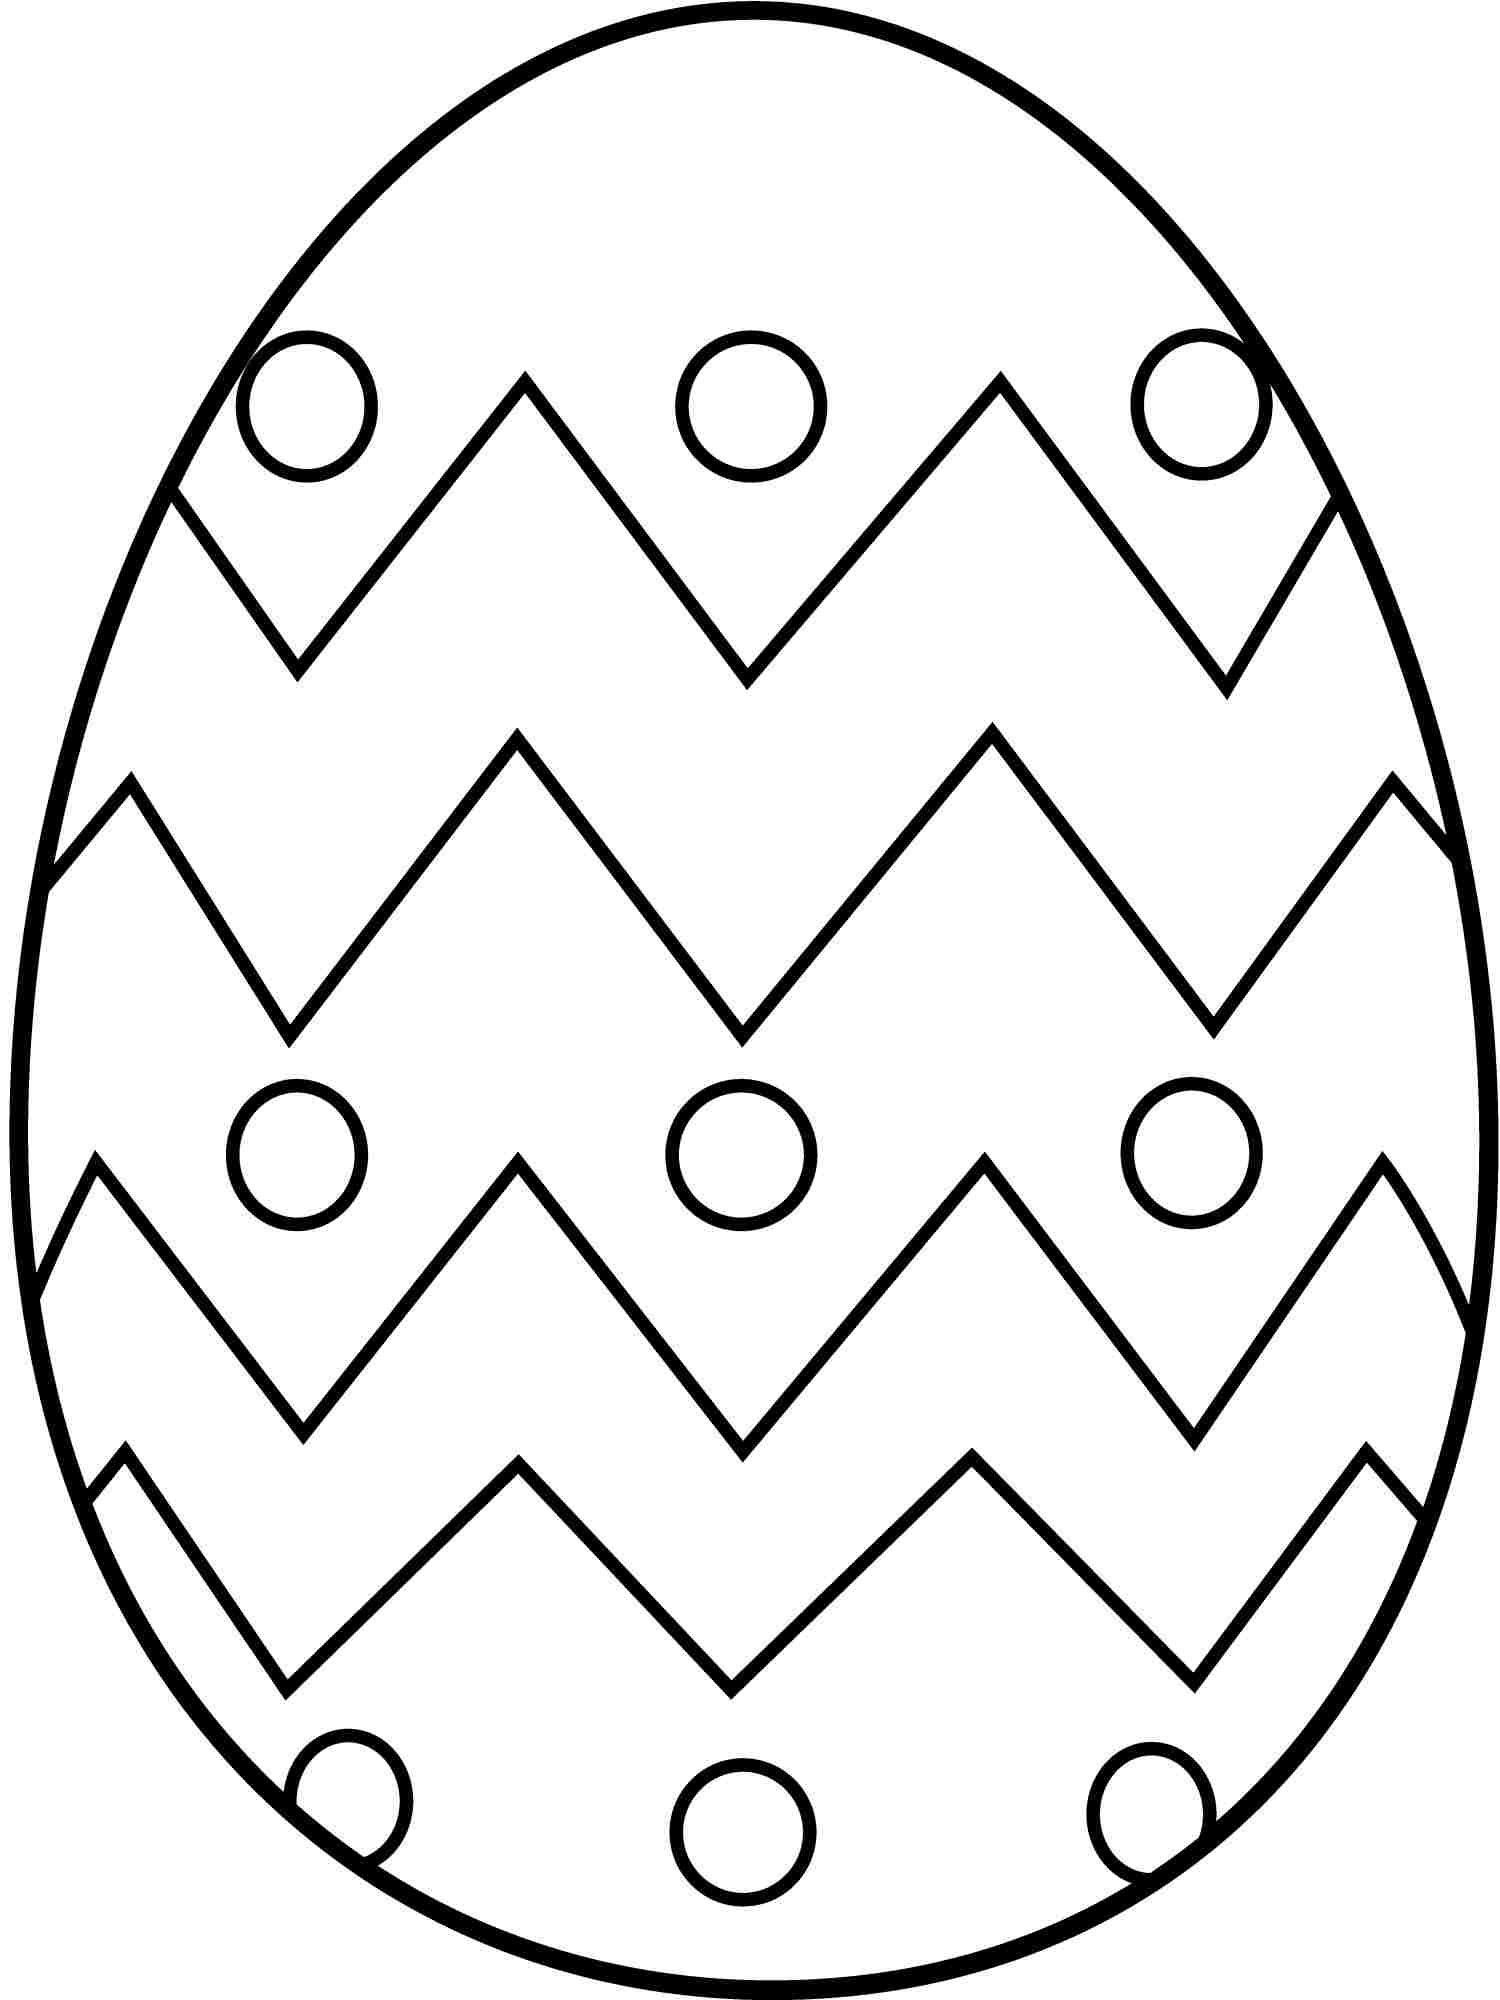 http://www.zeofire.com/wp-content/uploads/19/19/19-easter-egg